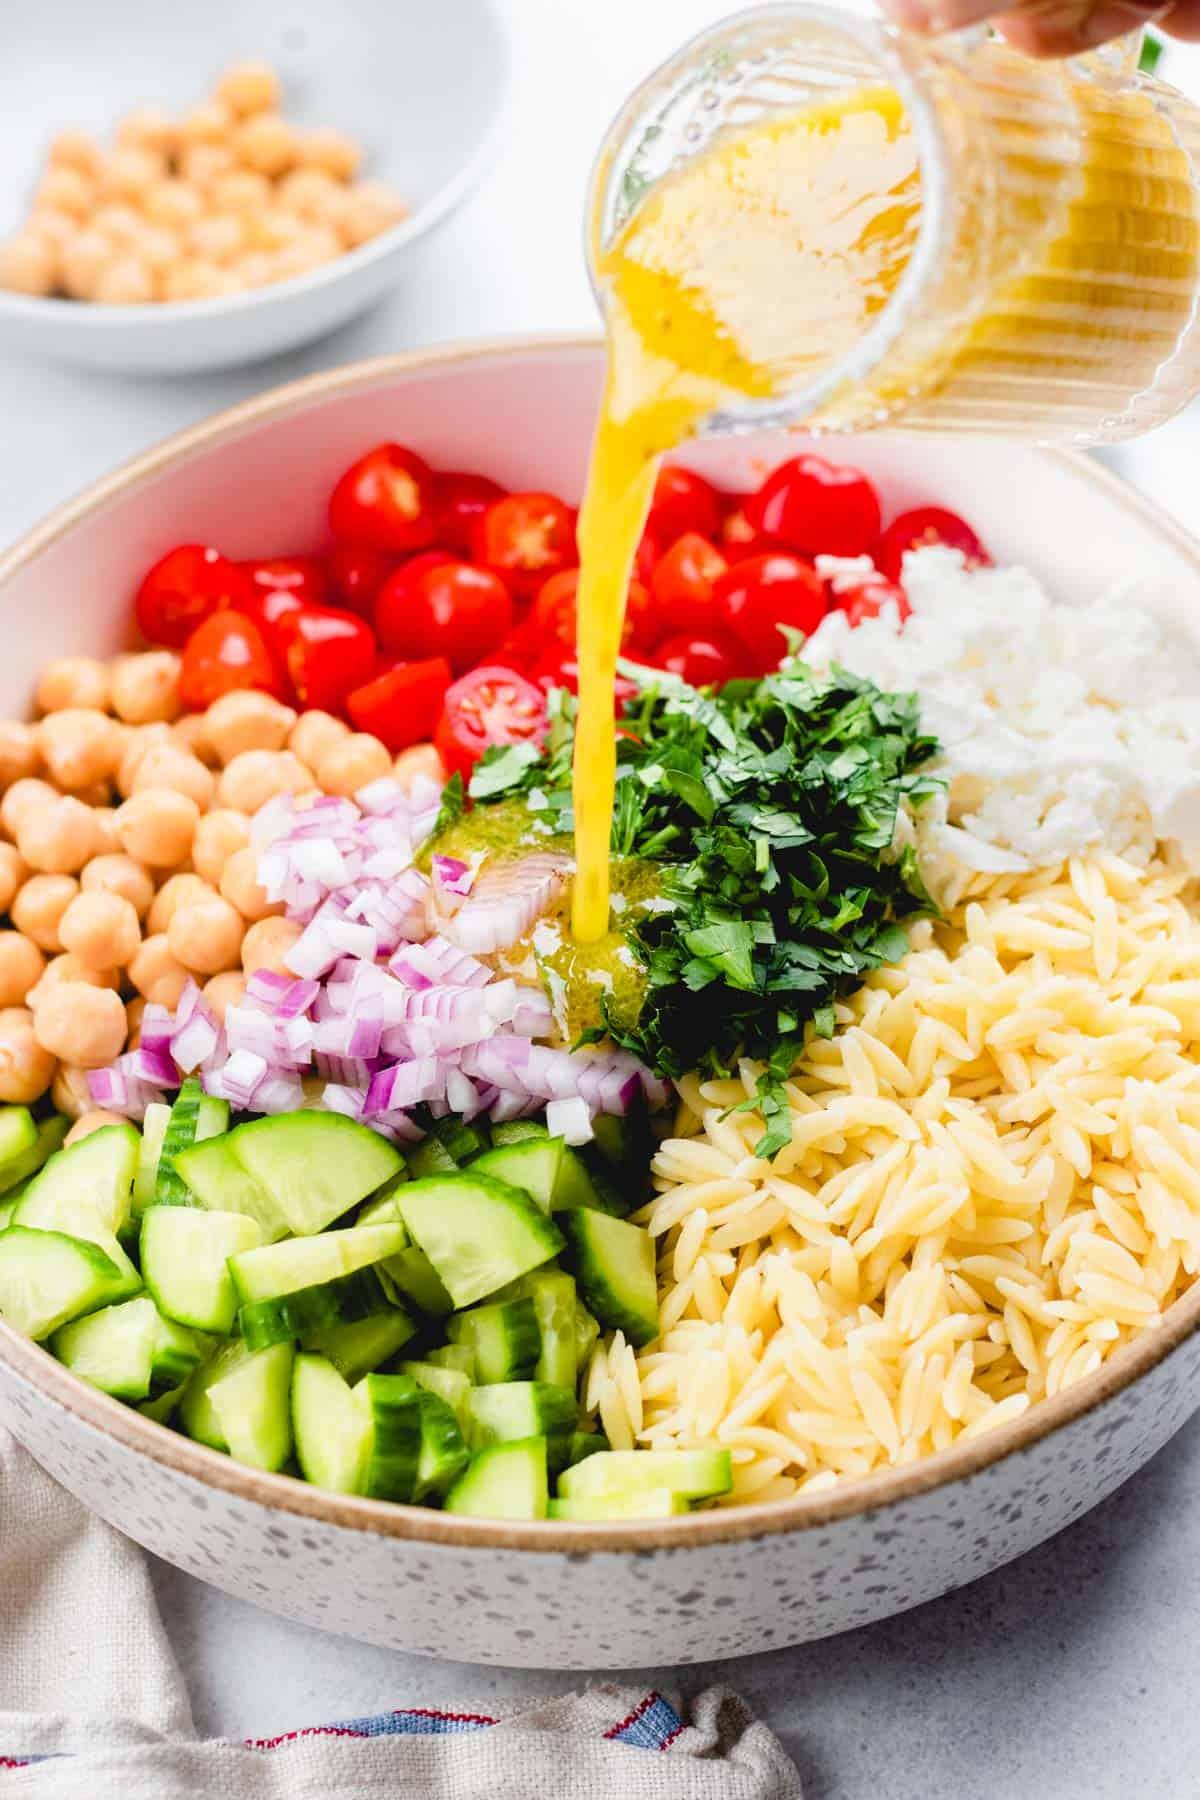 Pouring vinaigrette into the salad.